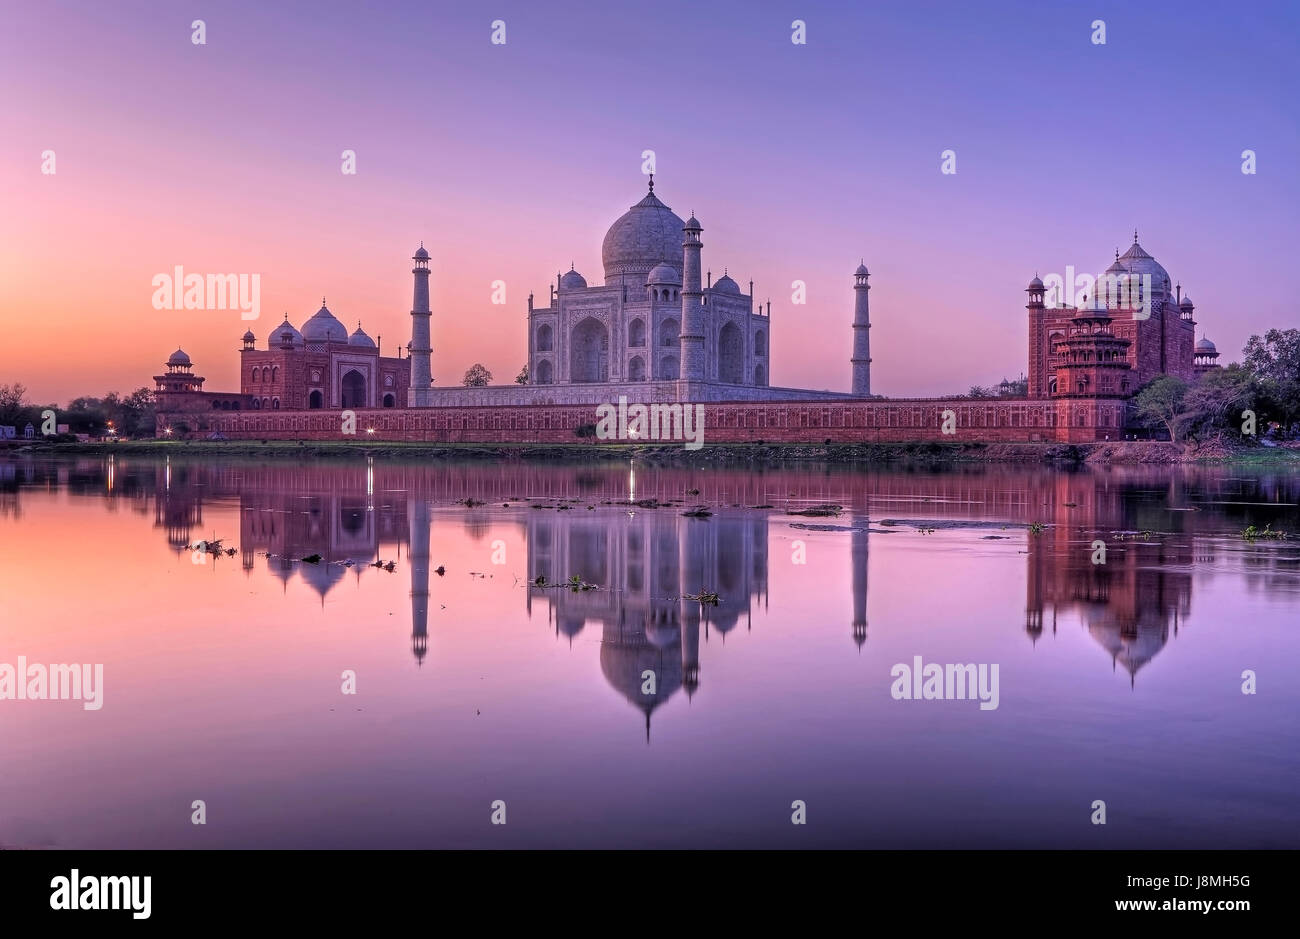 Taj Mahal, Agra, Uttar Pradesh, India. Imagen De Stock